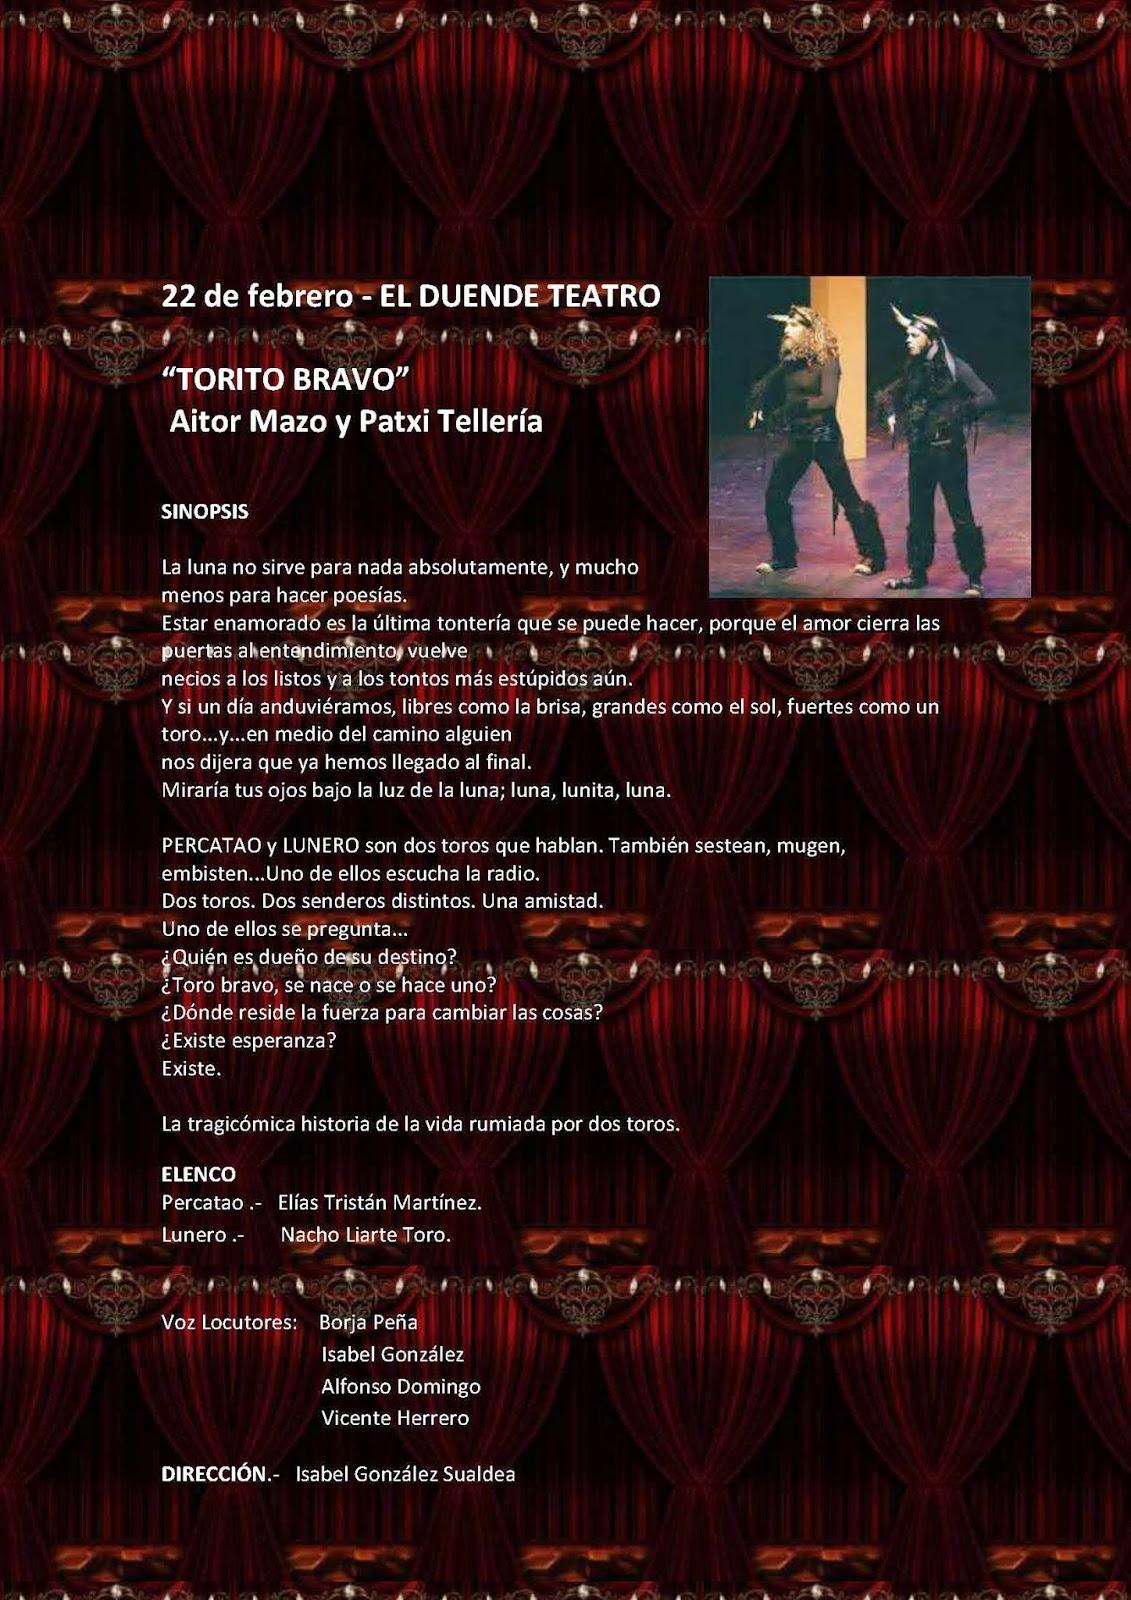 22/Febrero: XVII Certamen Nacional de teatro para aficionados. Béjar